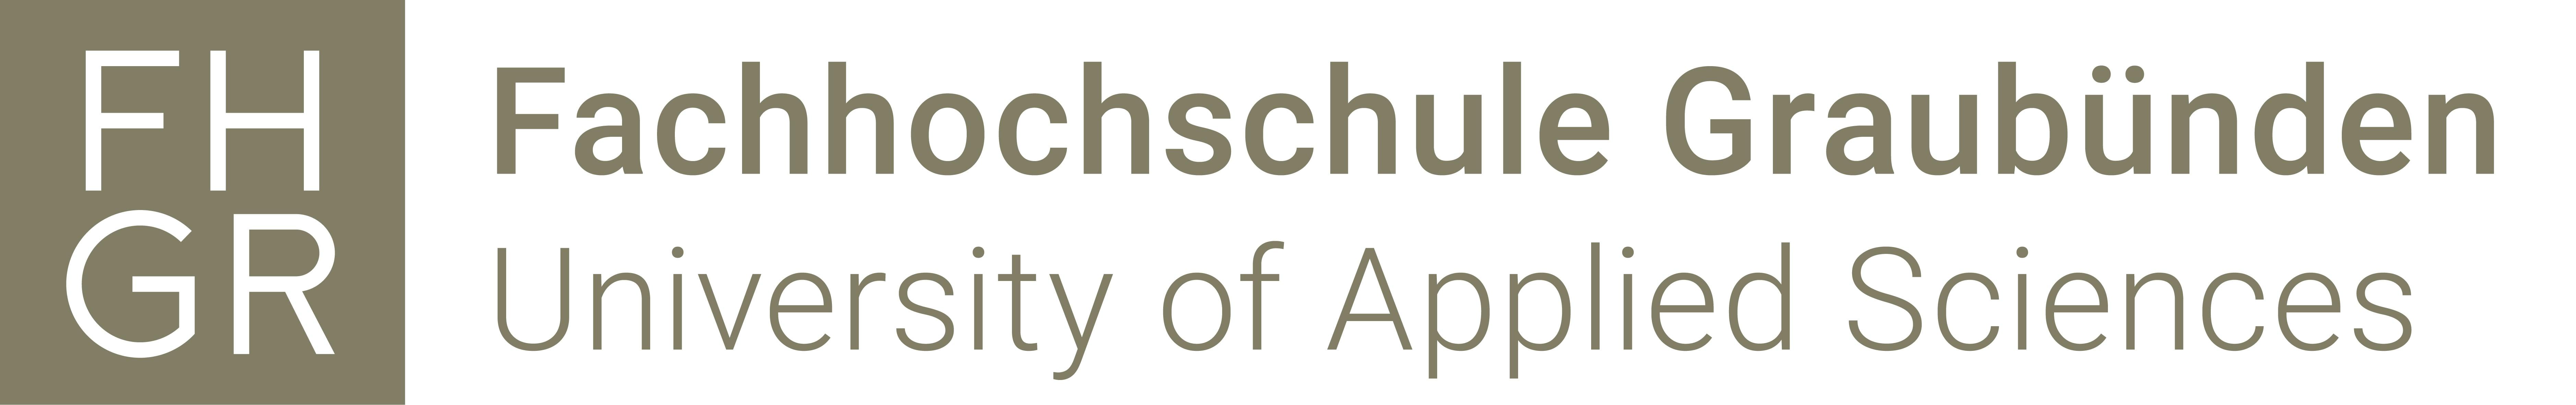 Logo Fachhochschule Graubünden